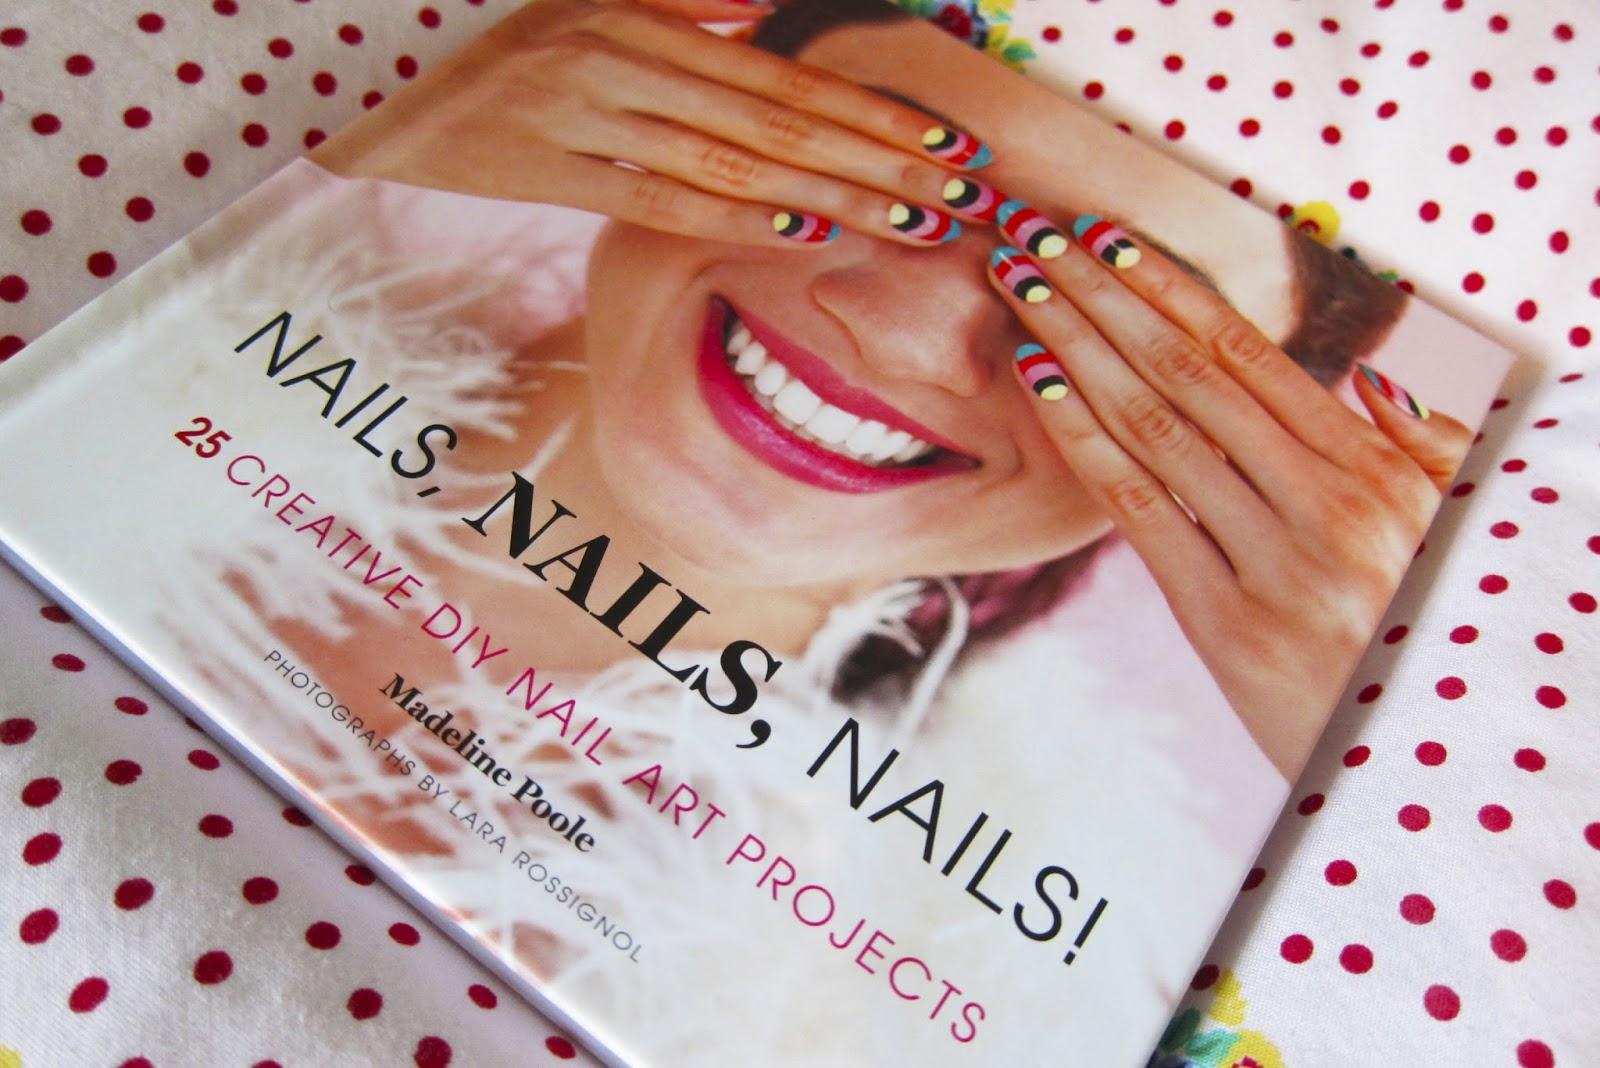 Nails, Nails, Nails- 25 Creative DIY Nail Art Projects By Madeline ...